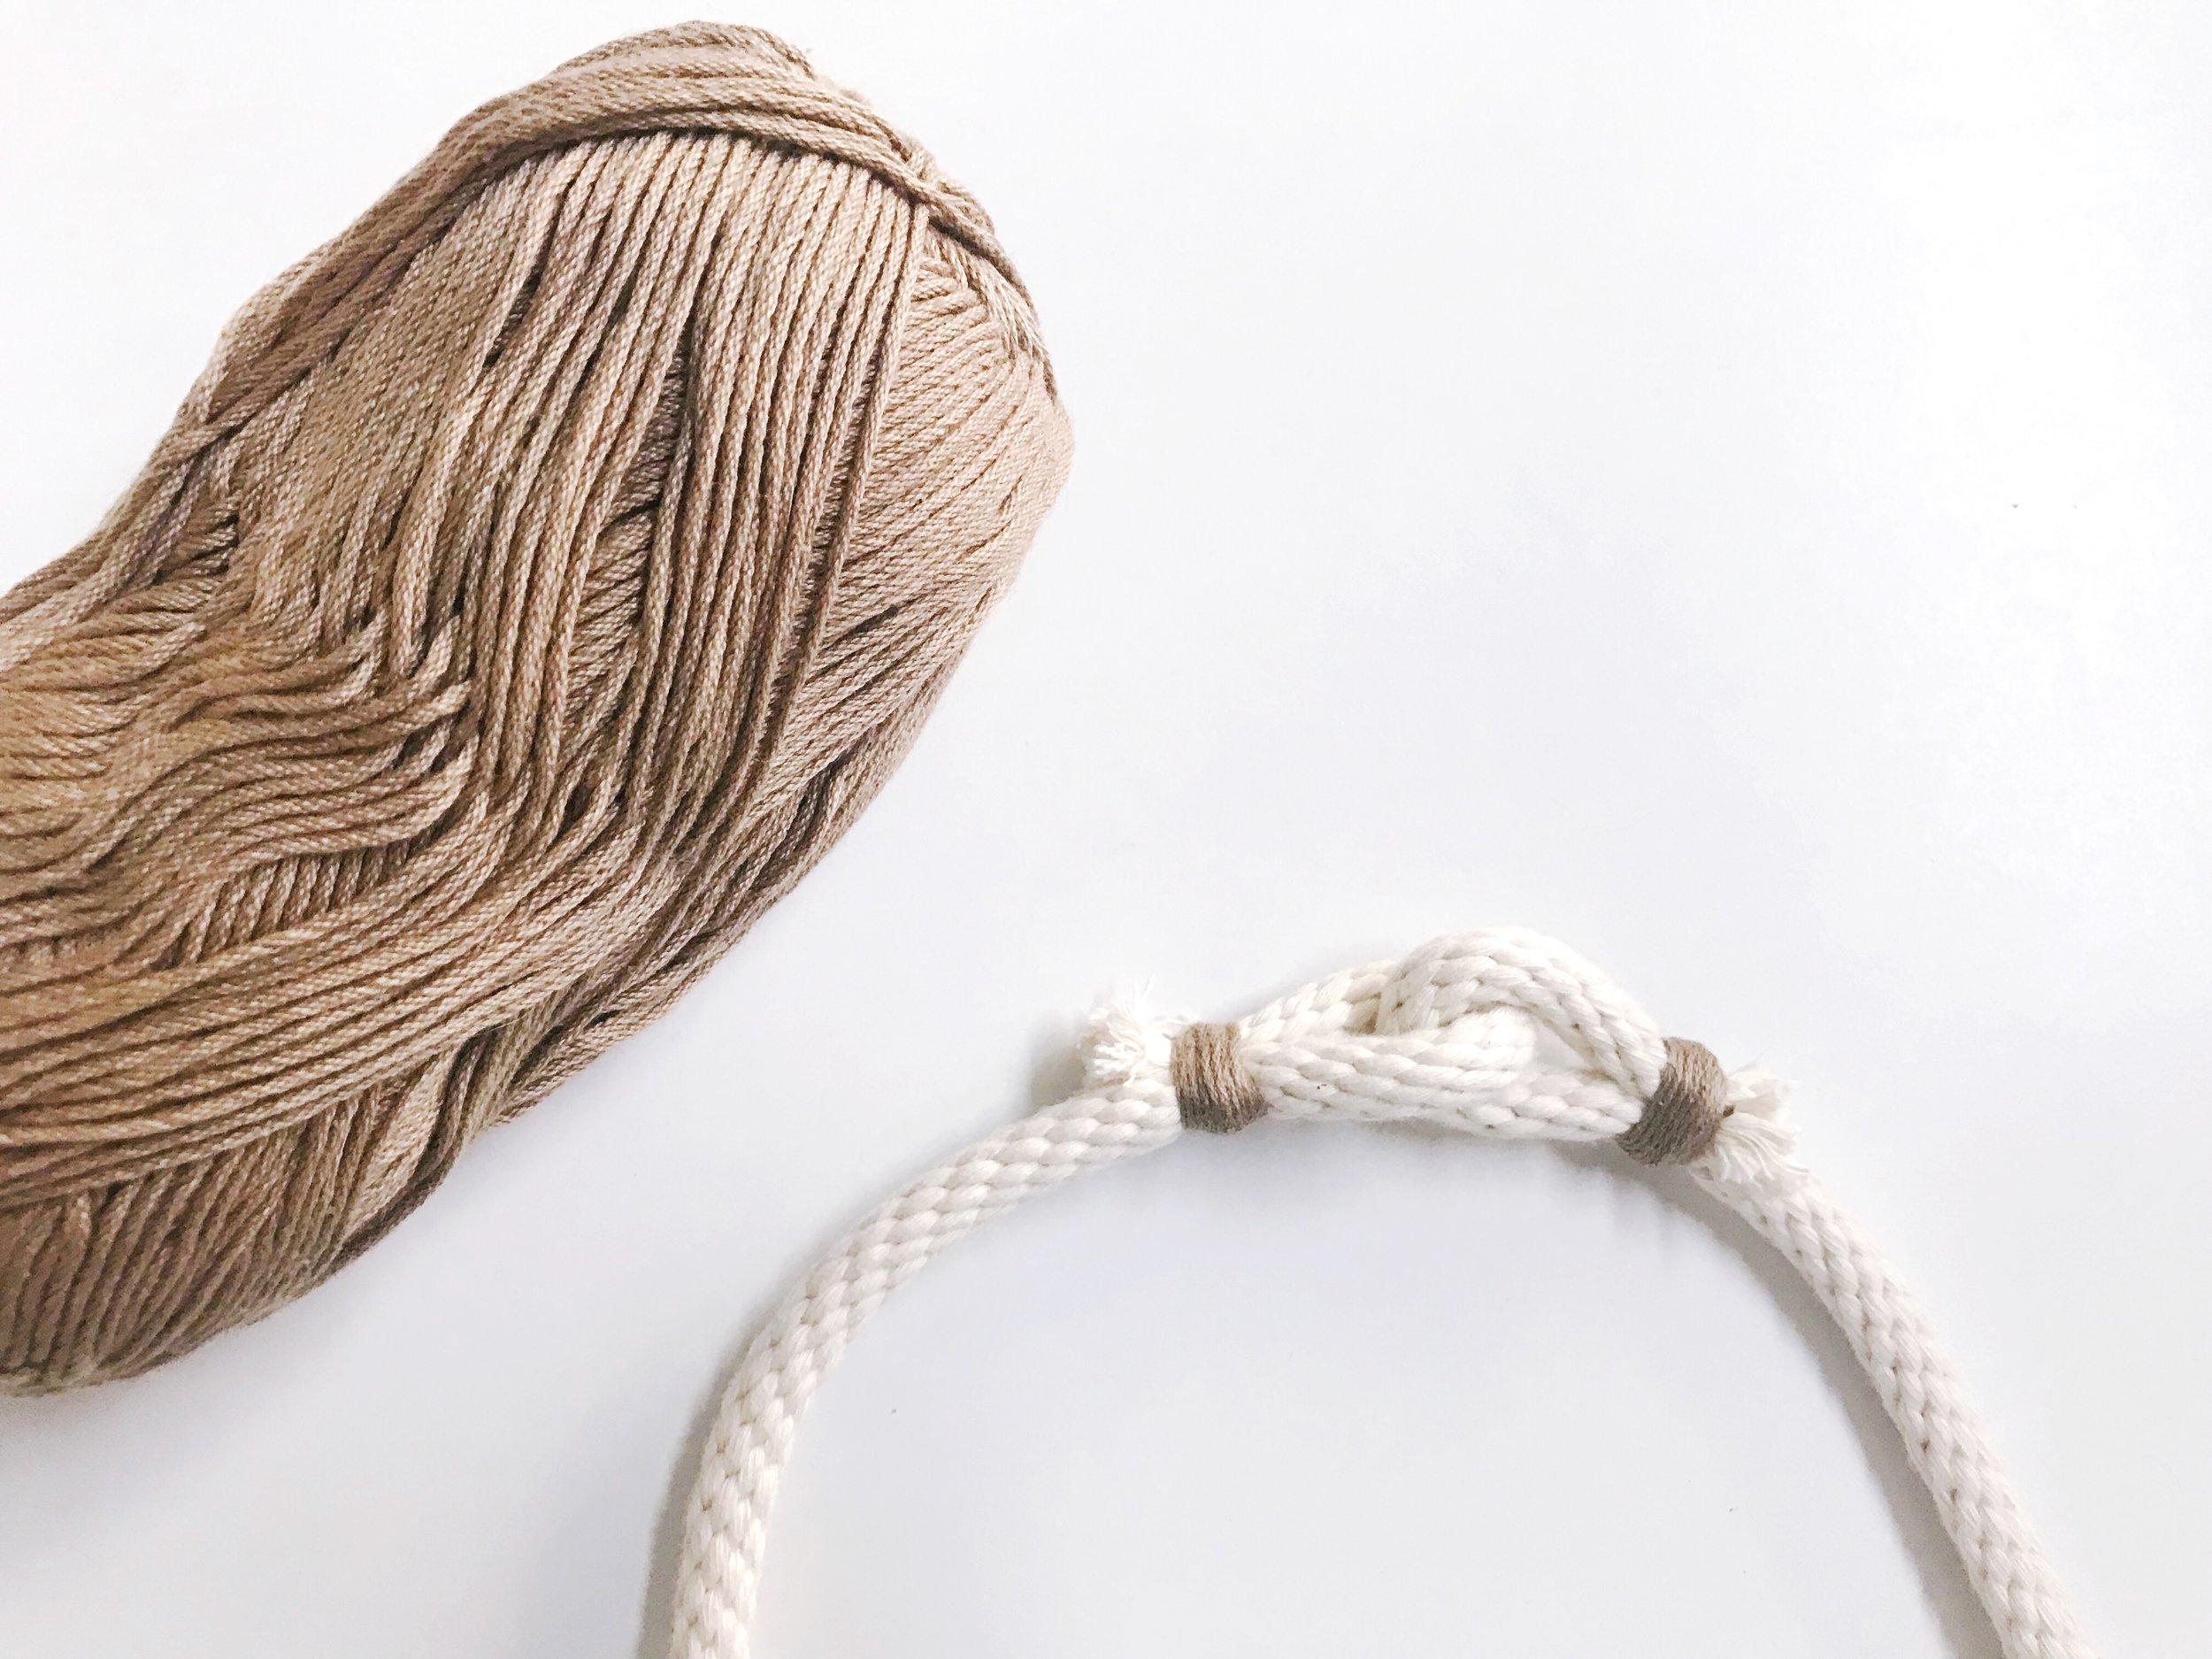 papercraftpantry-blog-diy-handmade-easy-necklace.jpg